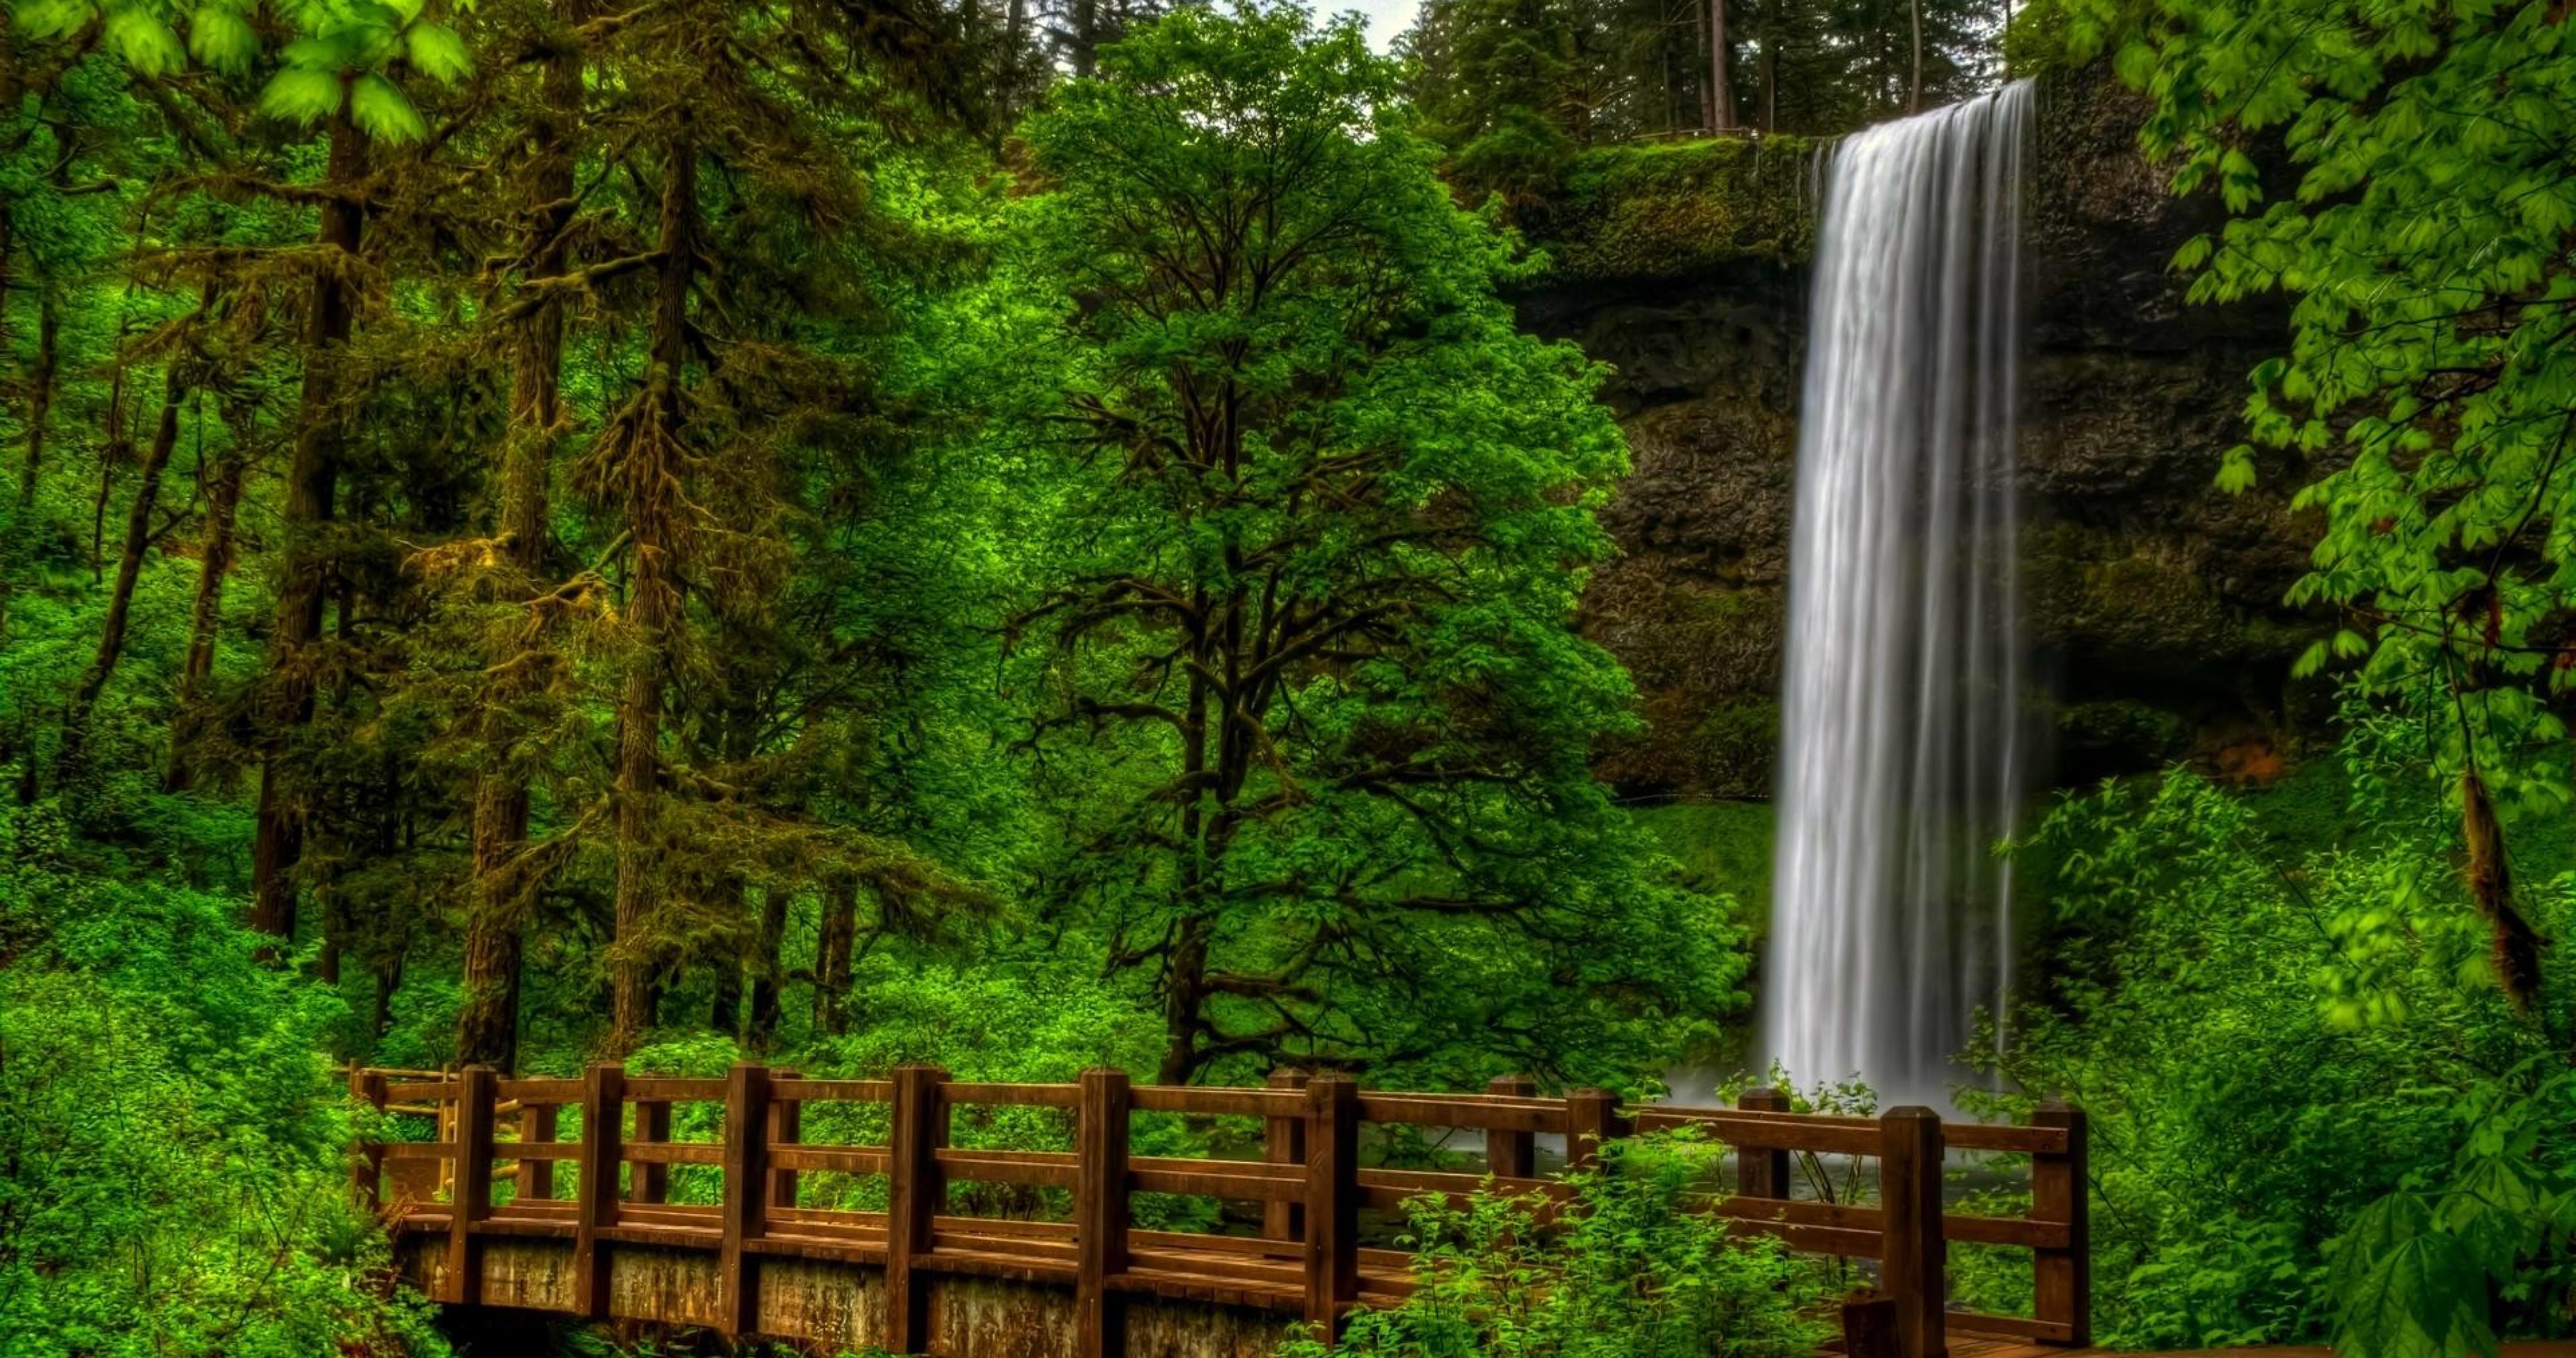 4k Wallpaper: 4K Waterfalls Wallpapers High Quality